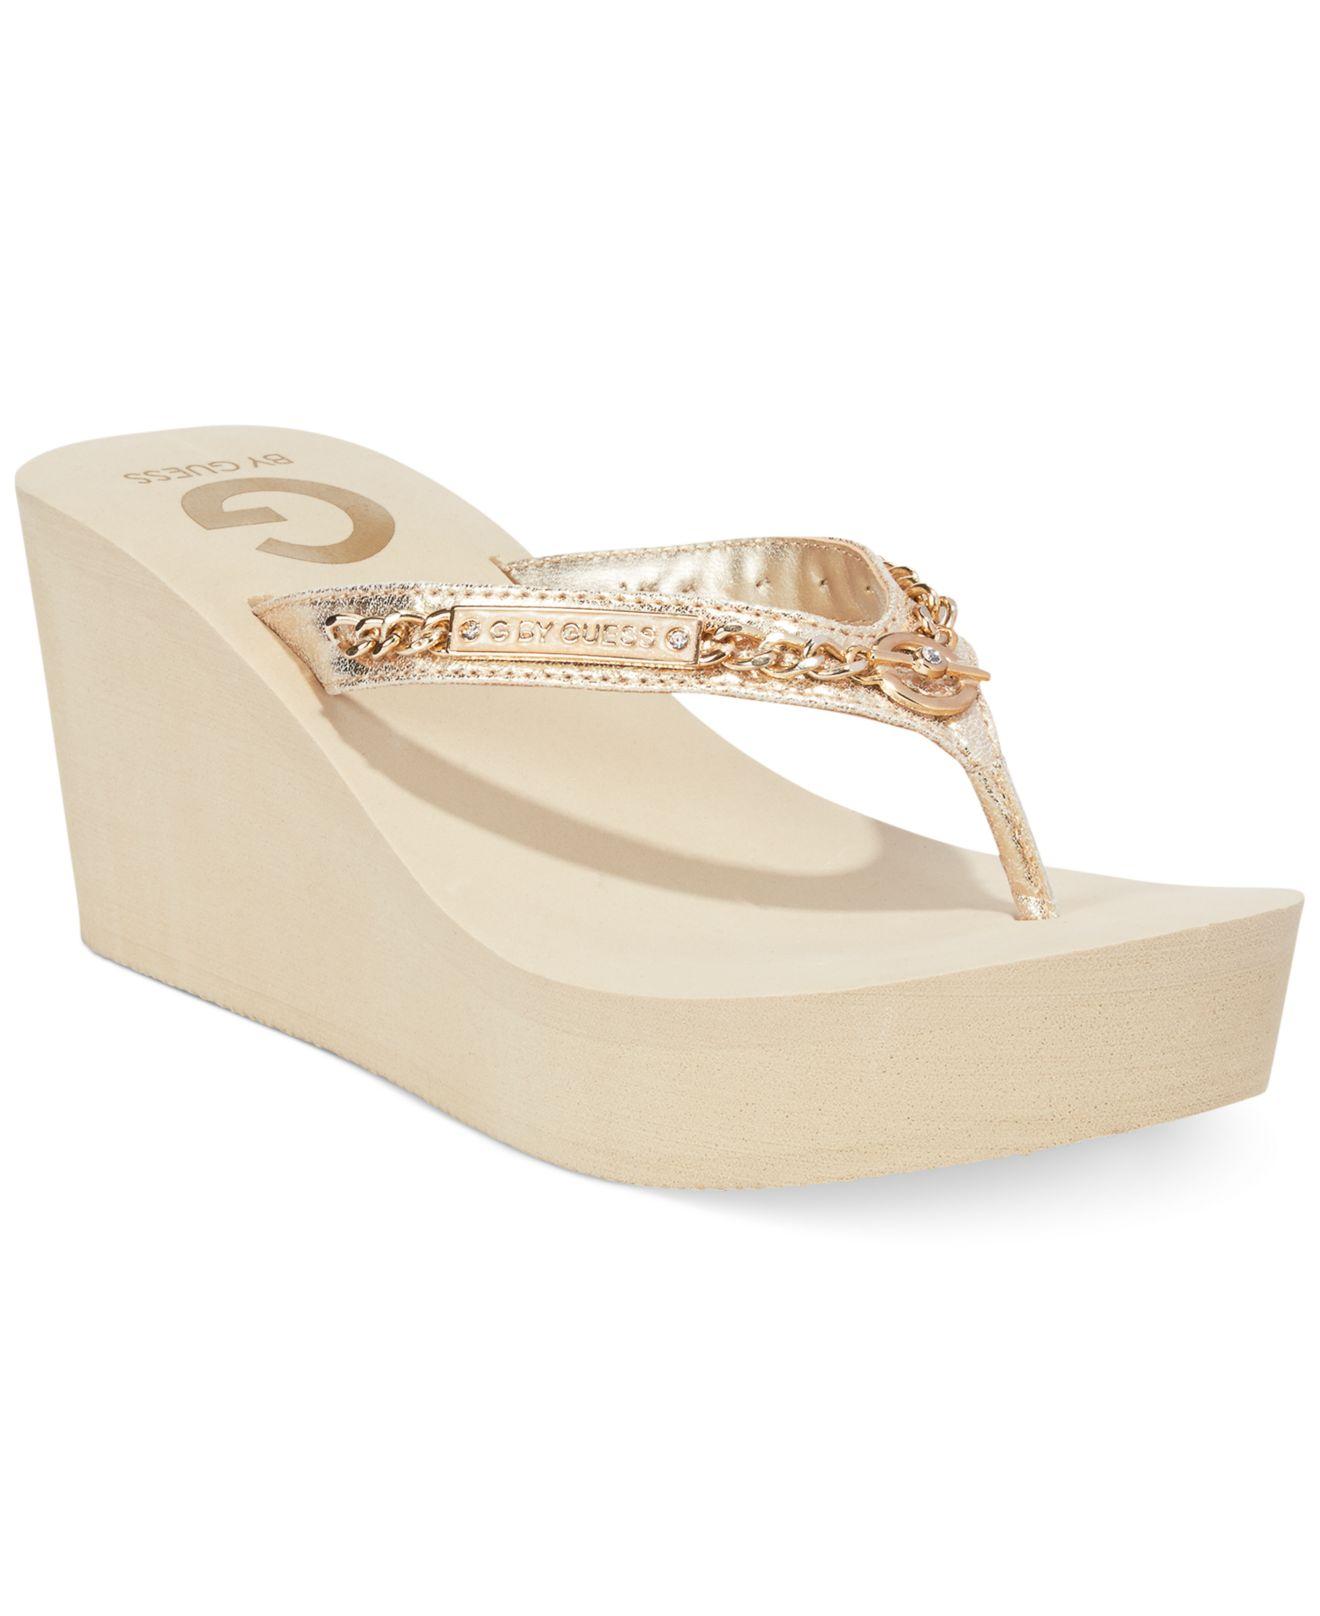 good selling retail prices nice cheap Women'S Suzee Platform Wedge Flip Flops